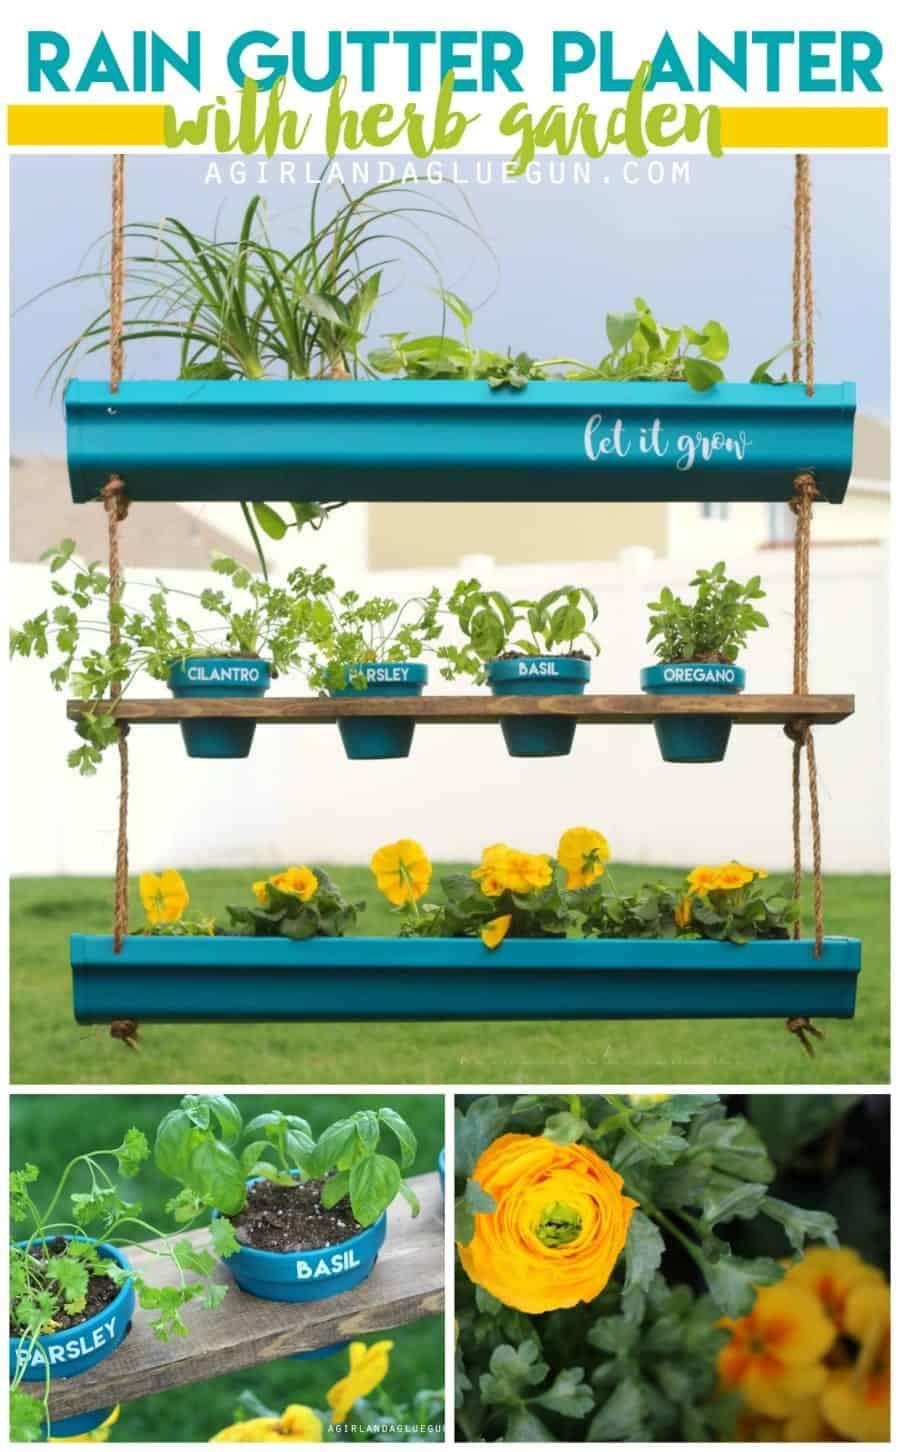 hanging rain gutter planter with herb garden